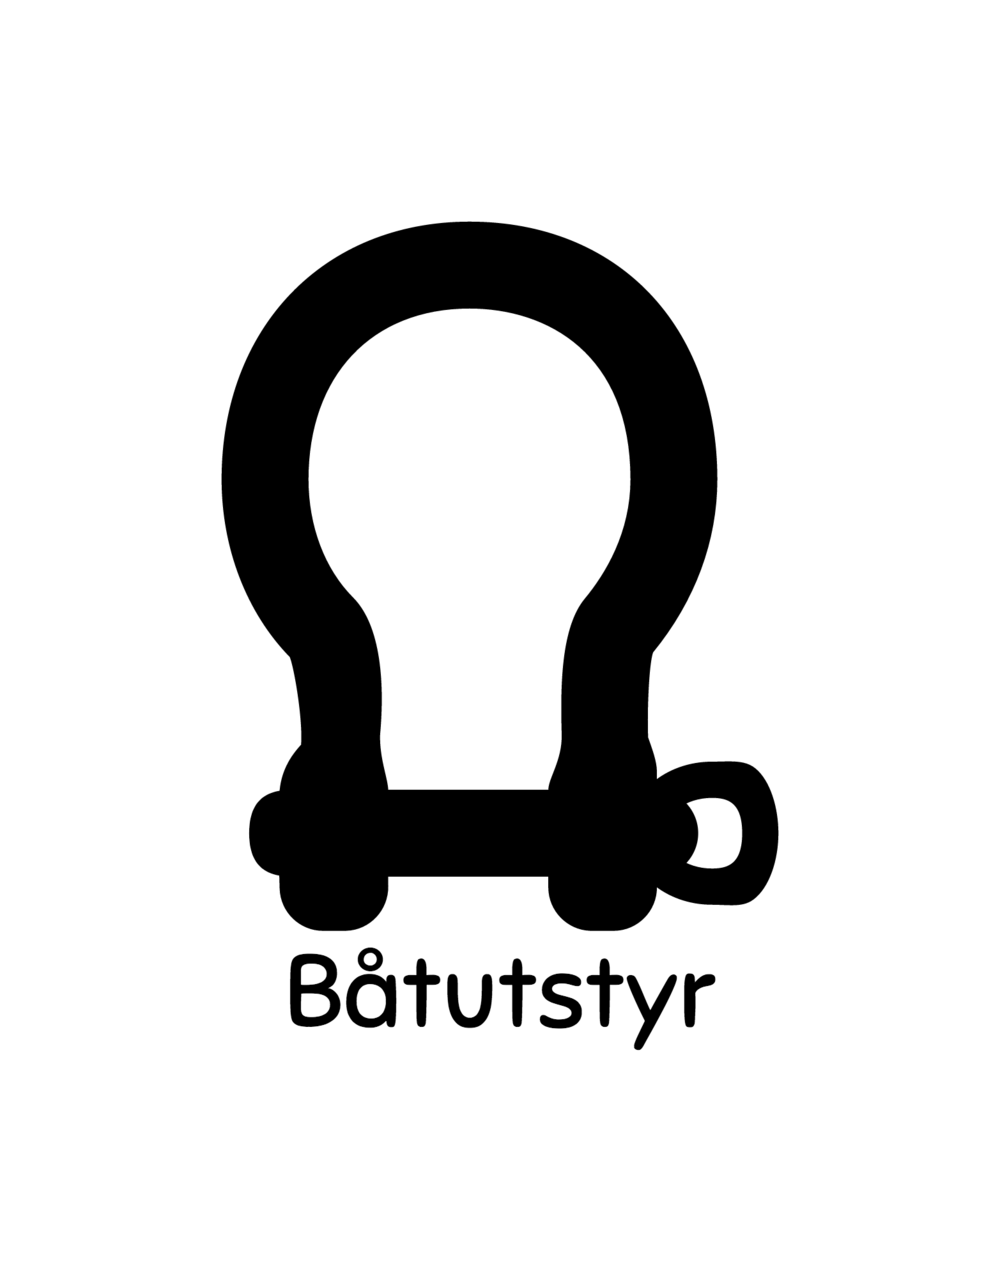 Båtutstyr-logo-black.png